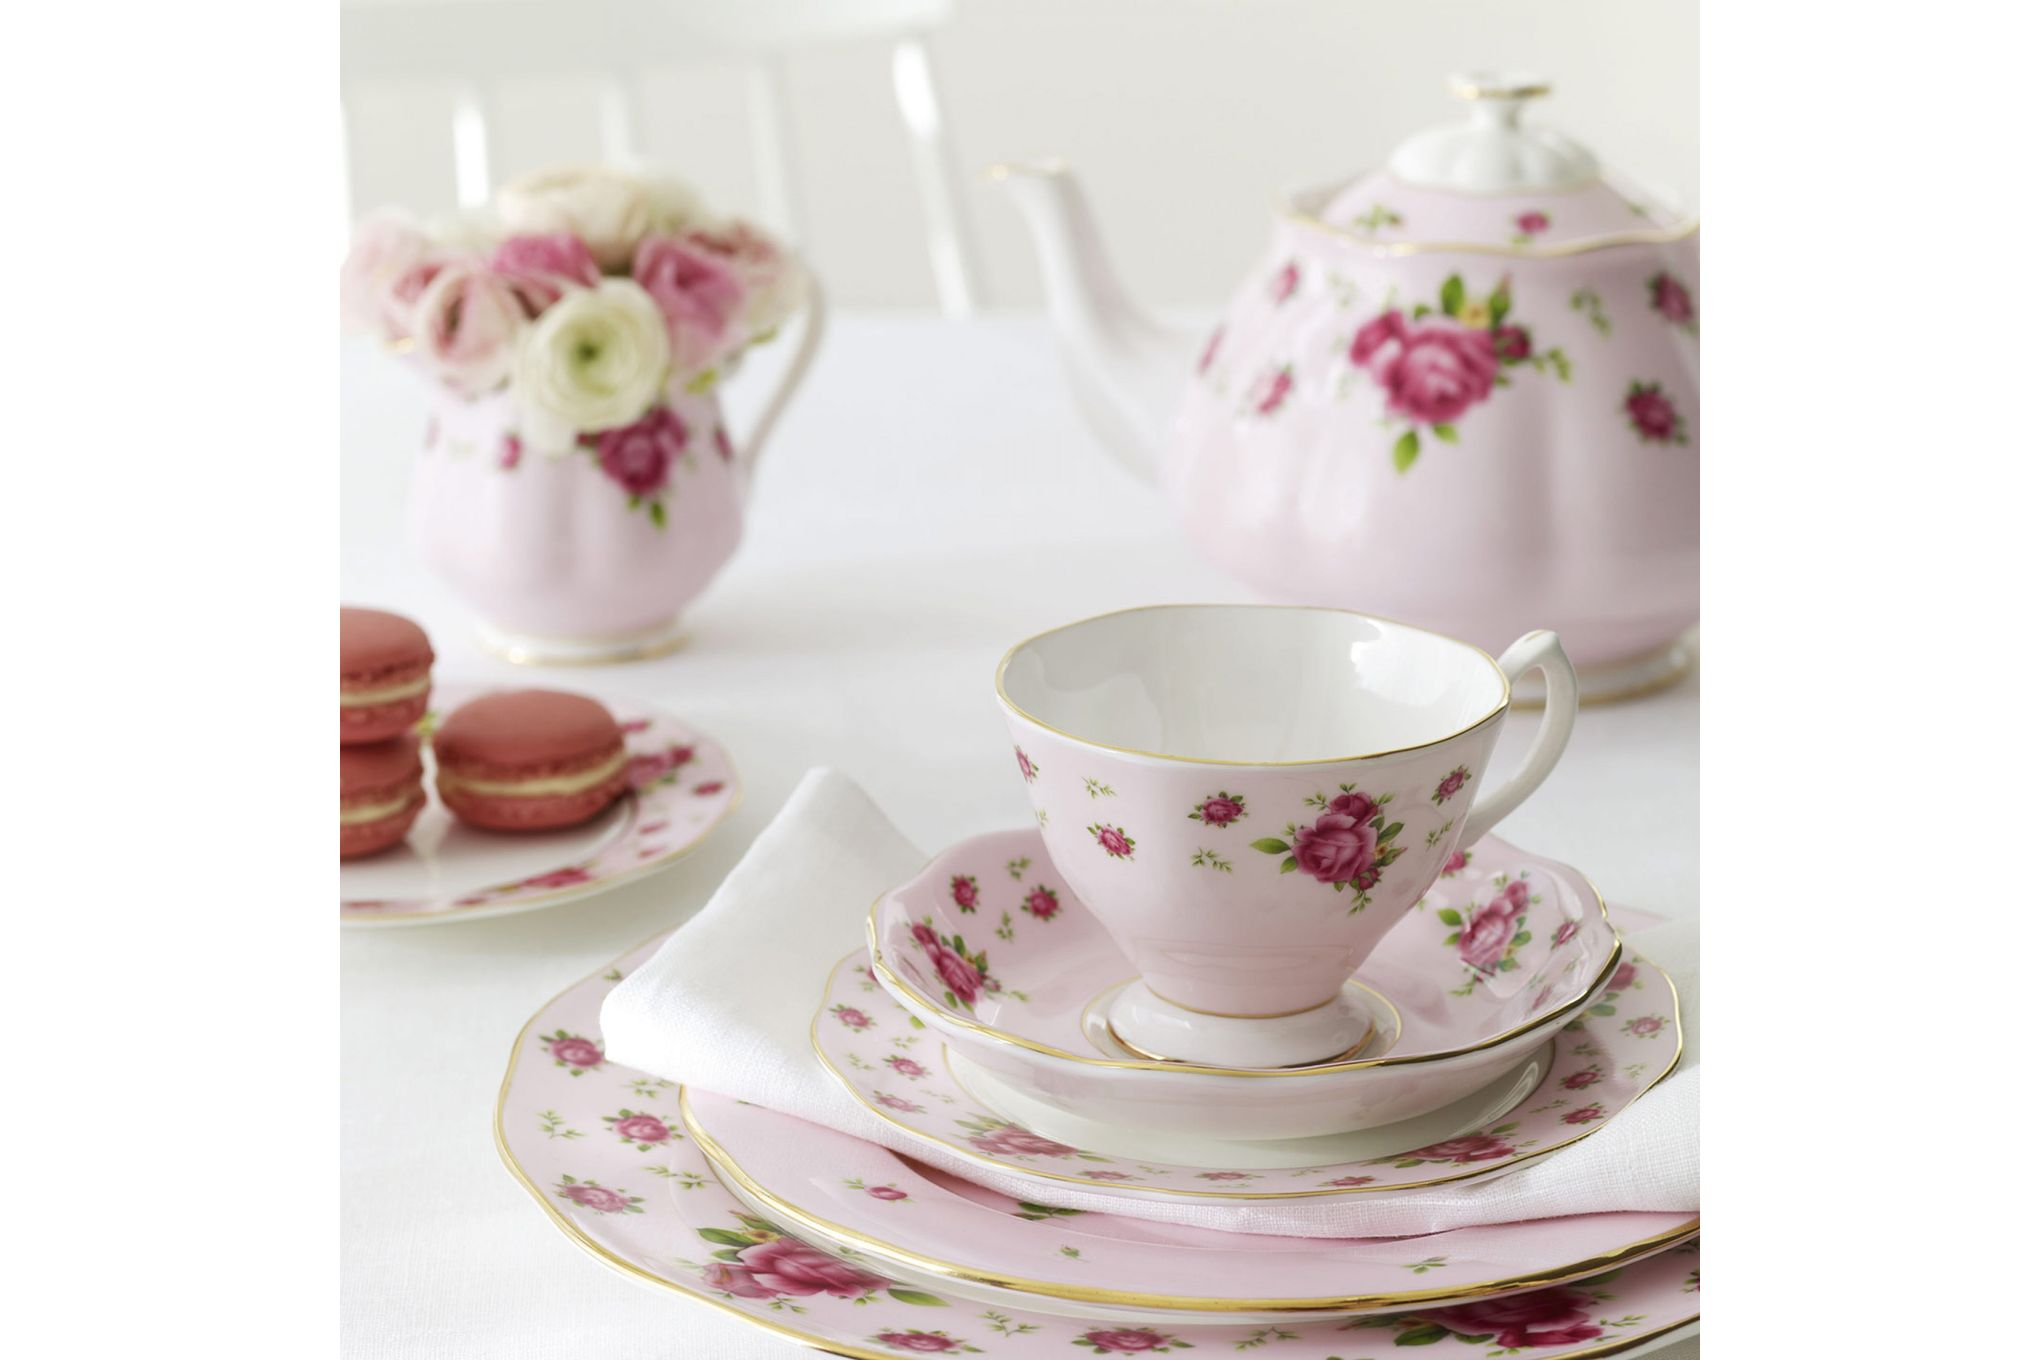 Royal Albert New Country Roses Pink 3 Piece Tea set Teapot, Sugar, Creamer thumb 2